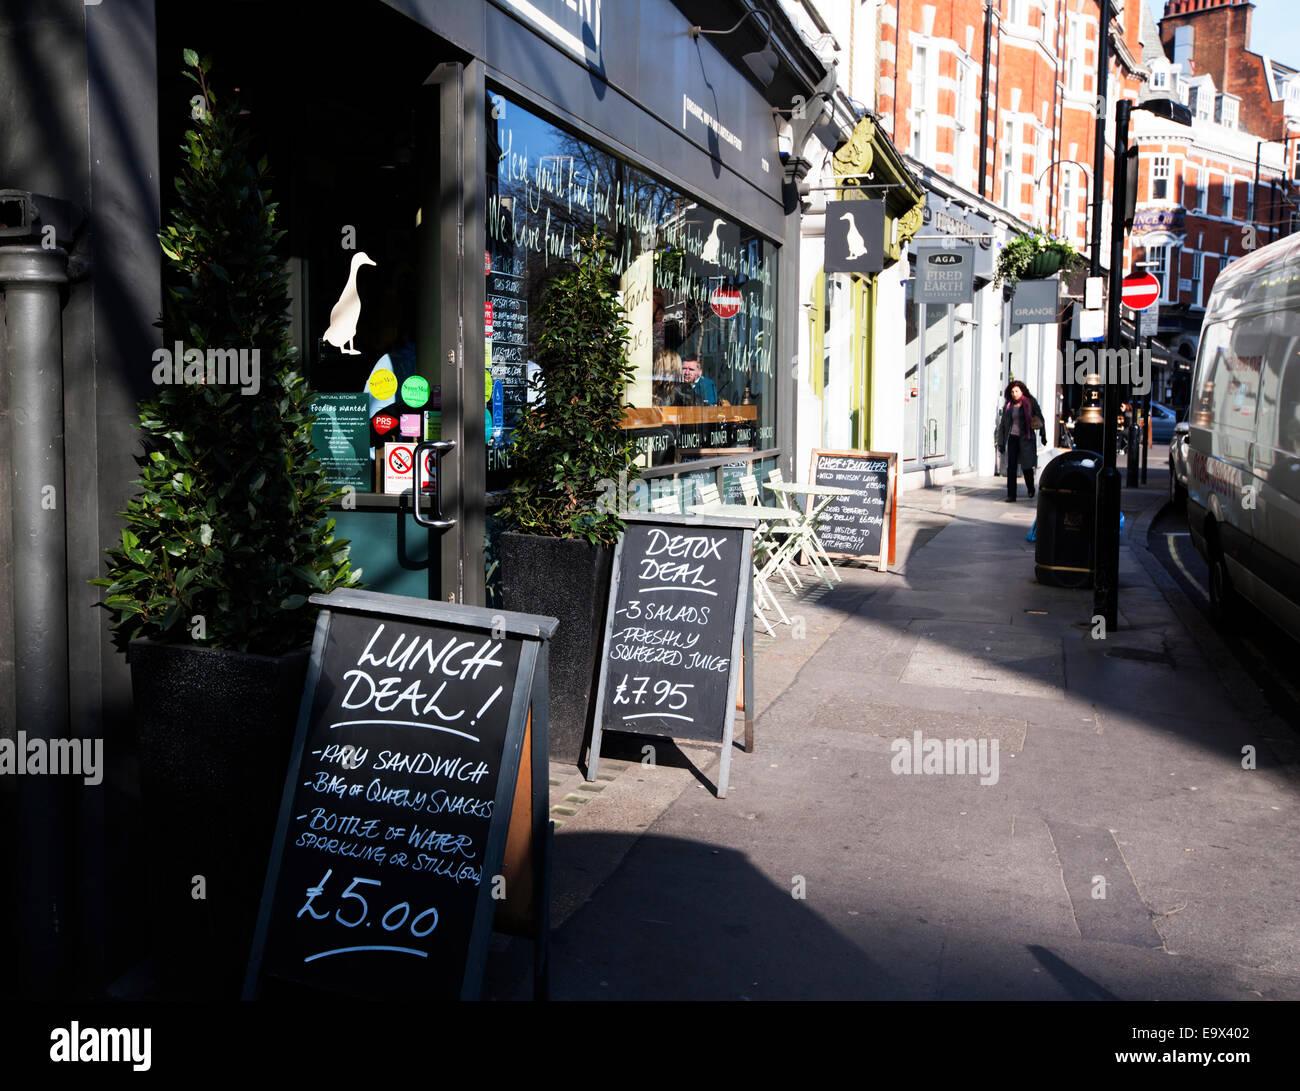 Lunch menus, Marylebone High Street, London, England, UK - Stock Image